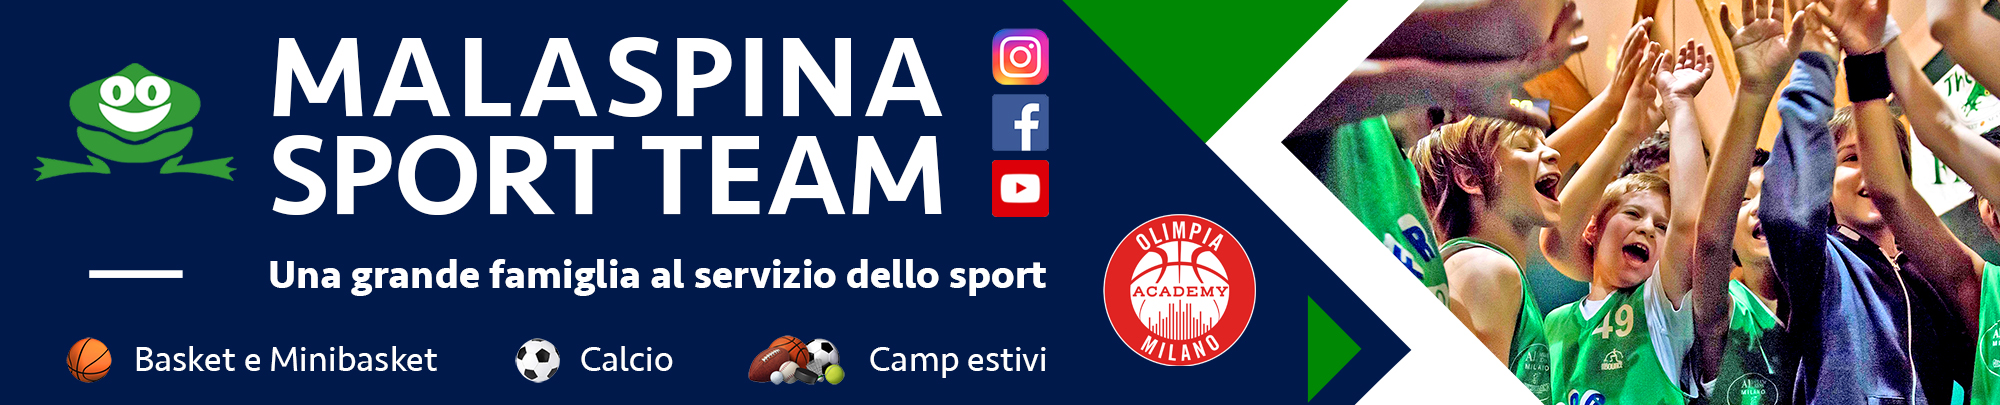 Malaspina Sport Team